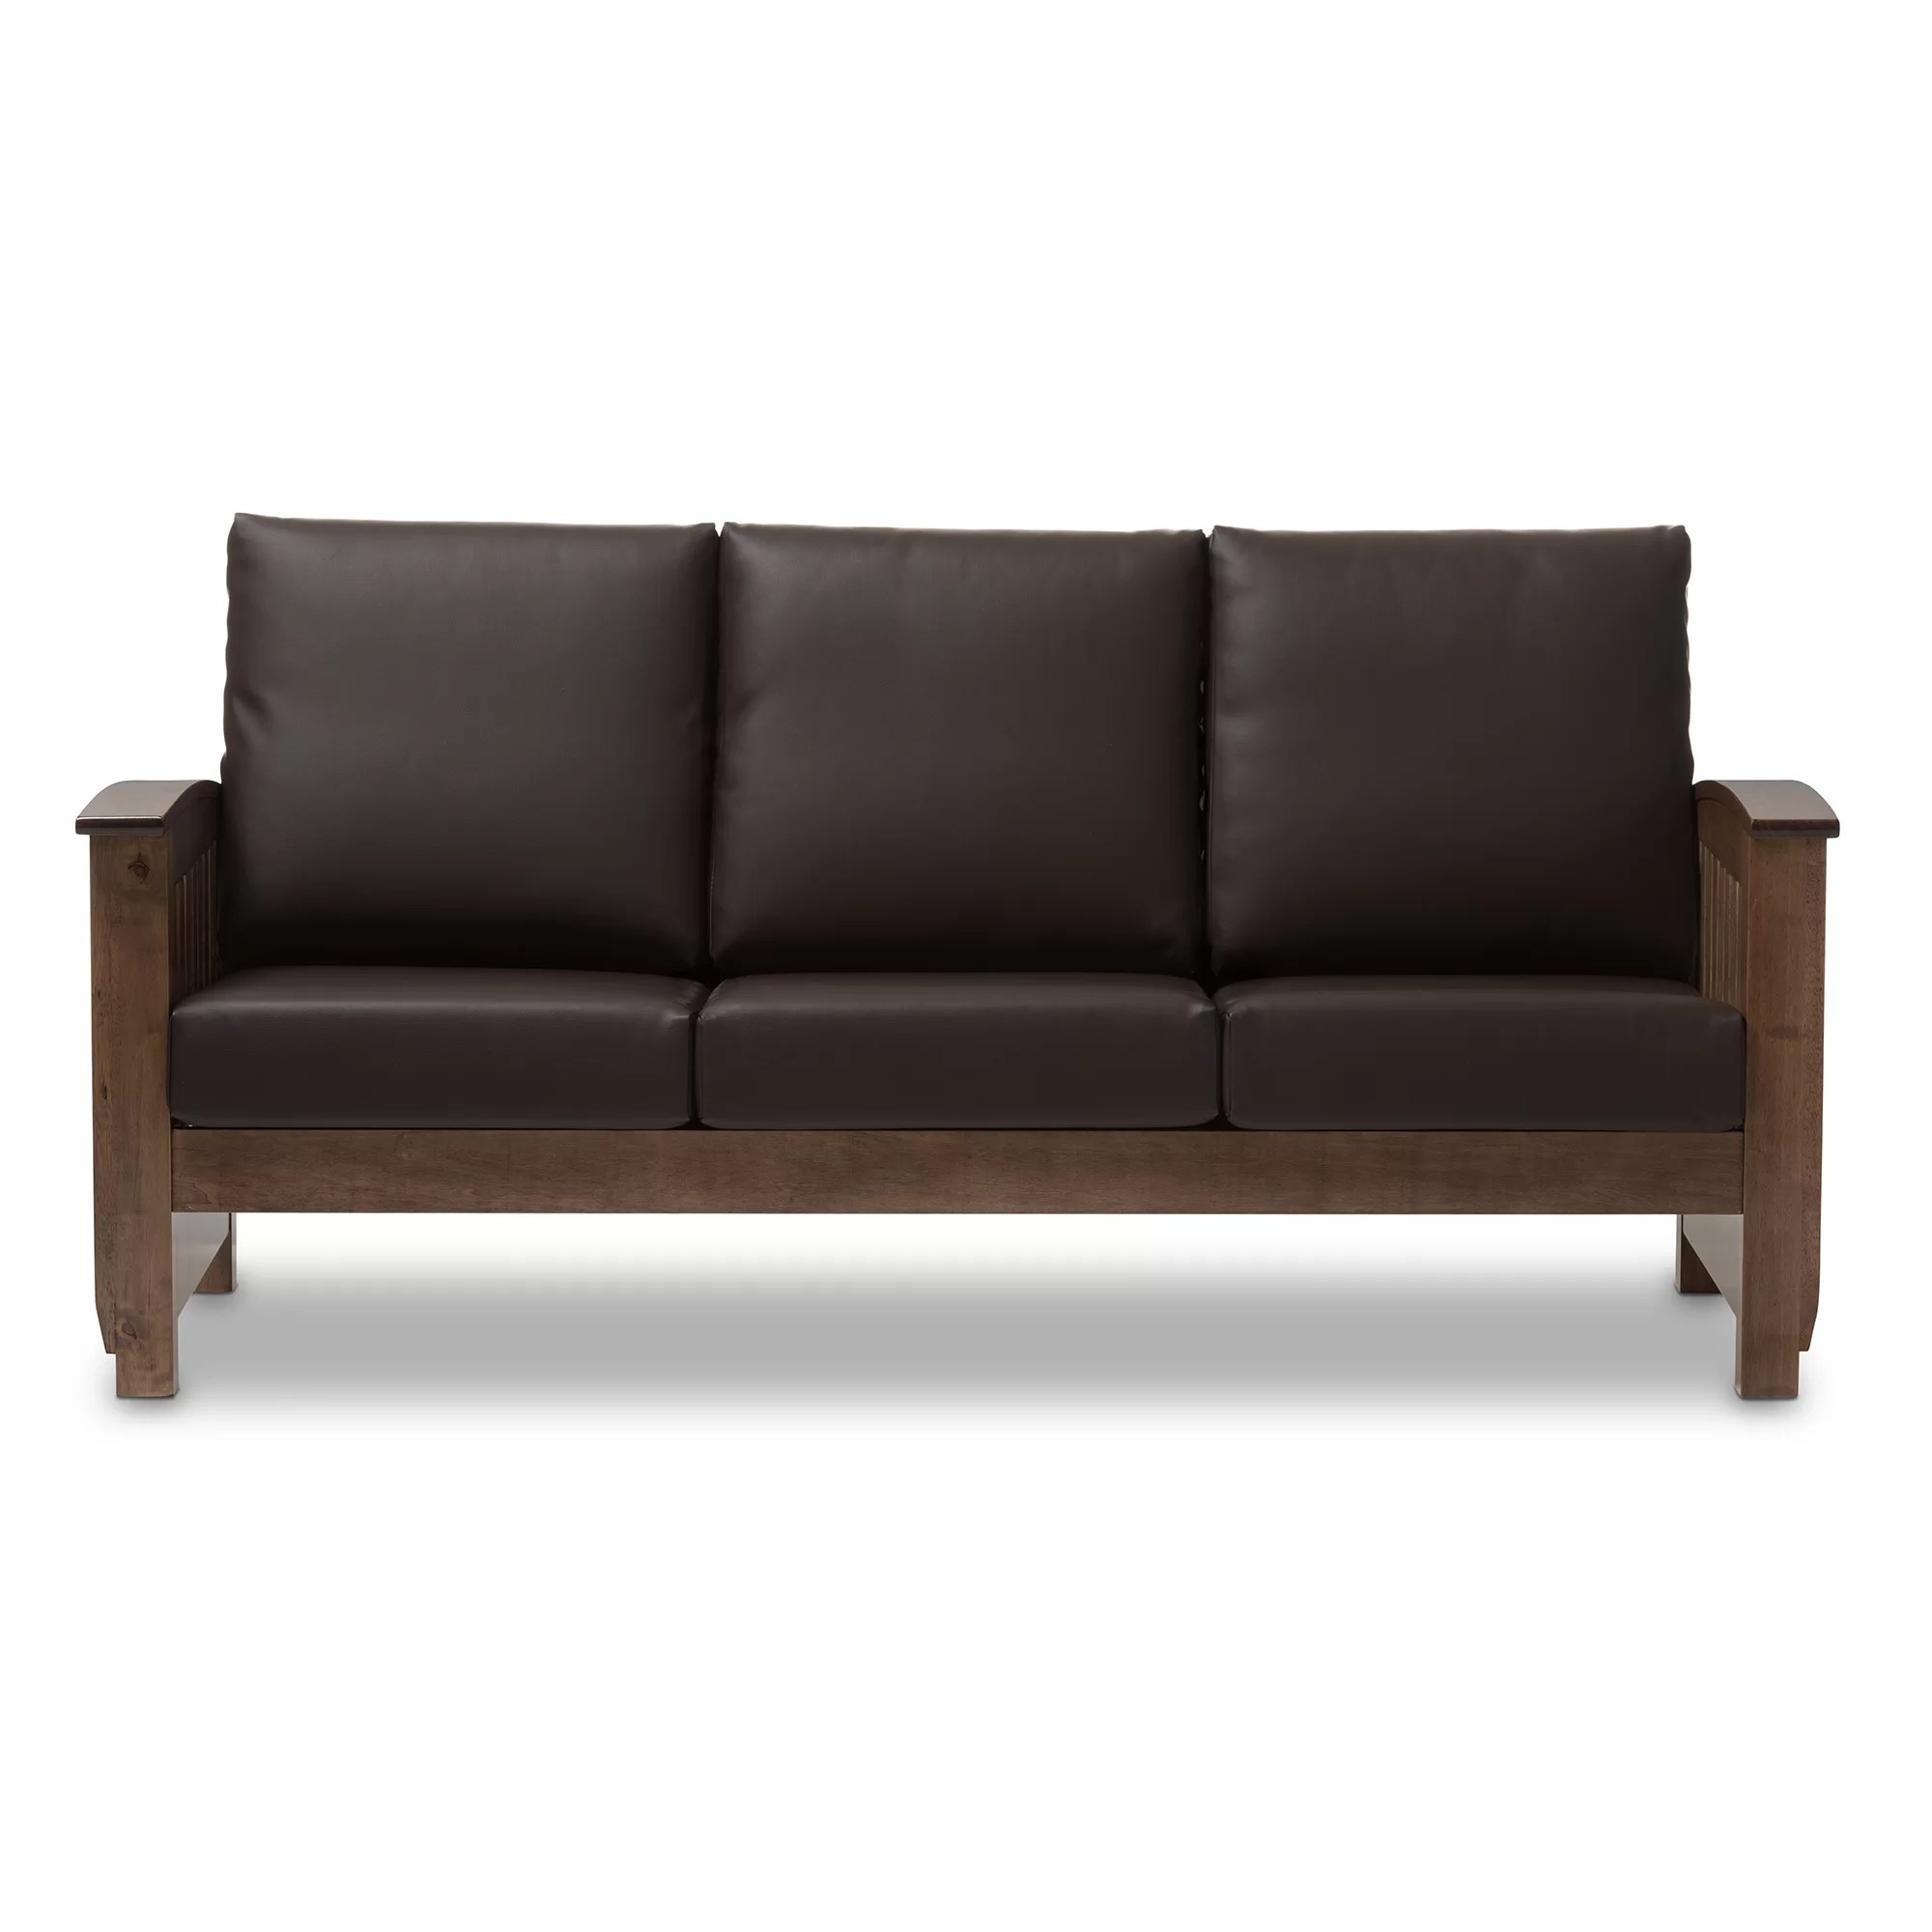 mission brown leather sofa loveseat sleeper covers wholesale interiors baxton studio benigno 3 seater